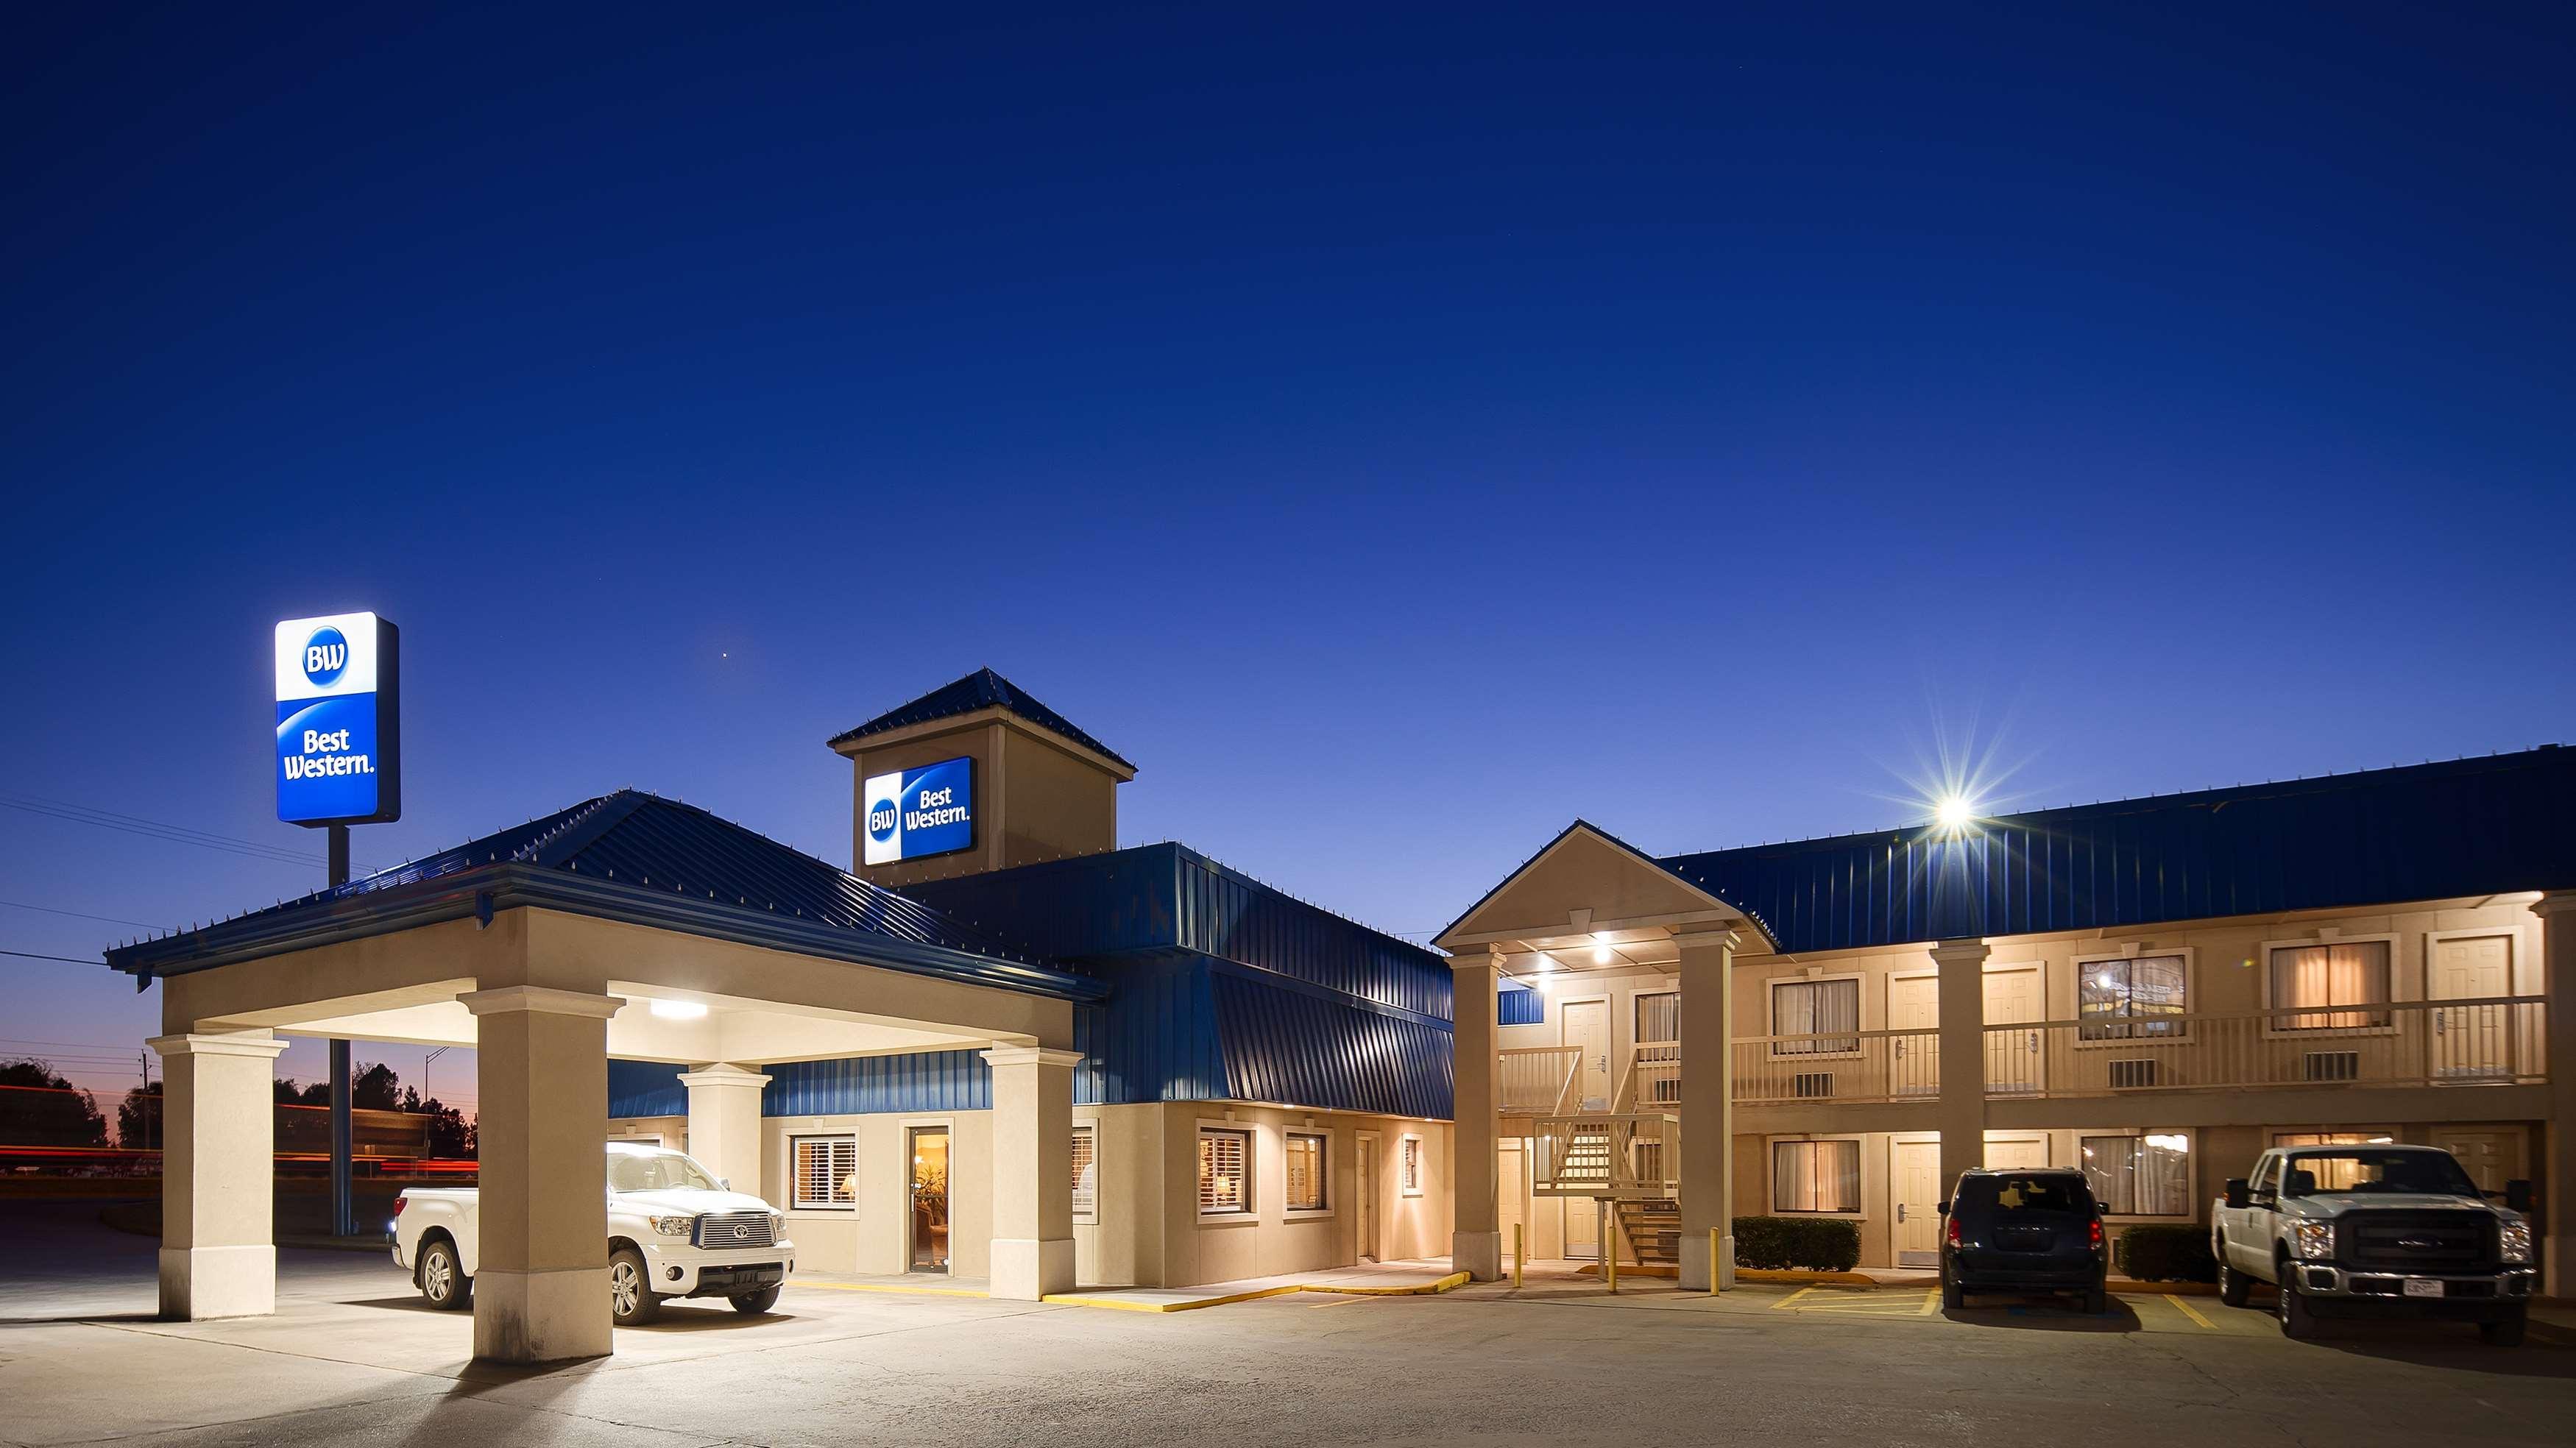 Best Western Inn of McAlester image 1